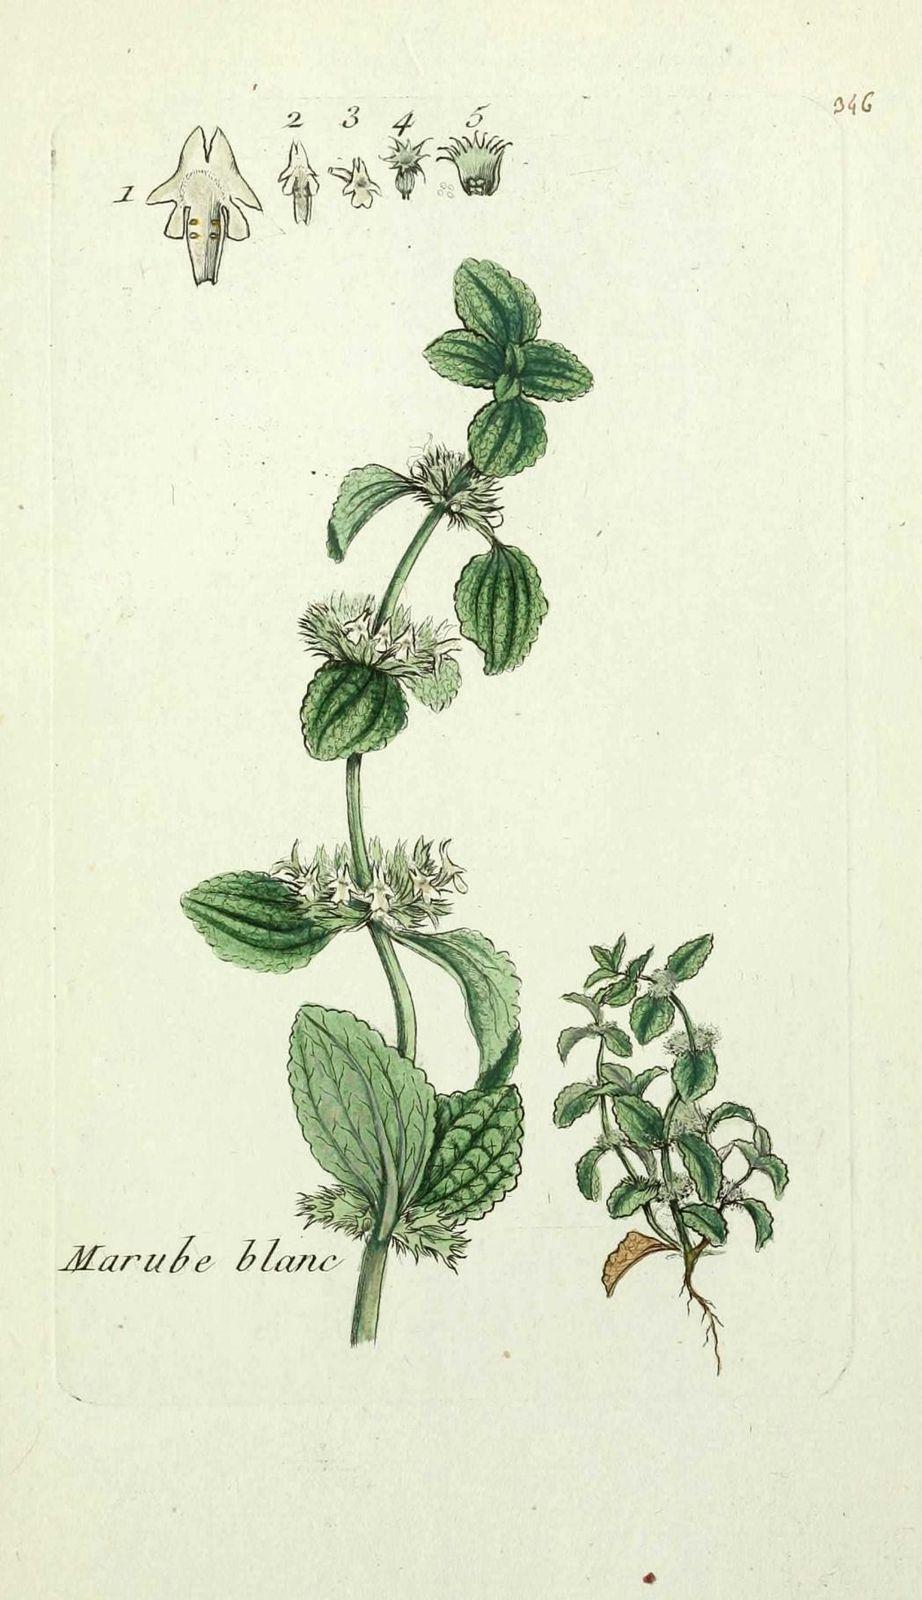 marrube blanc - marrubium vulgare ( herbe aux crocs, maroch